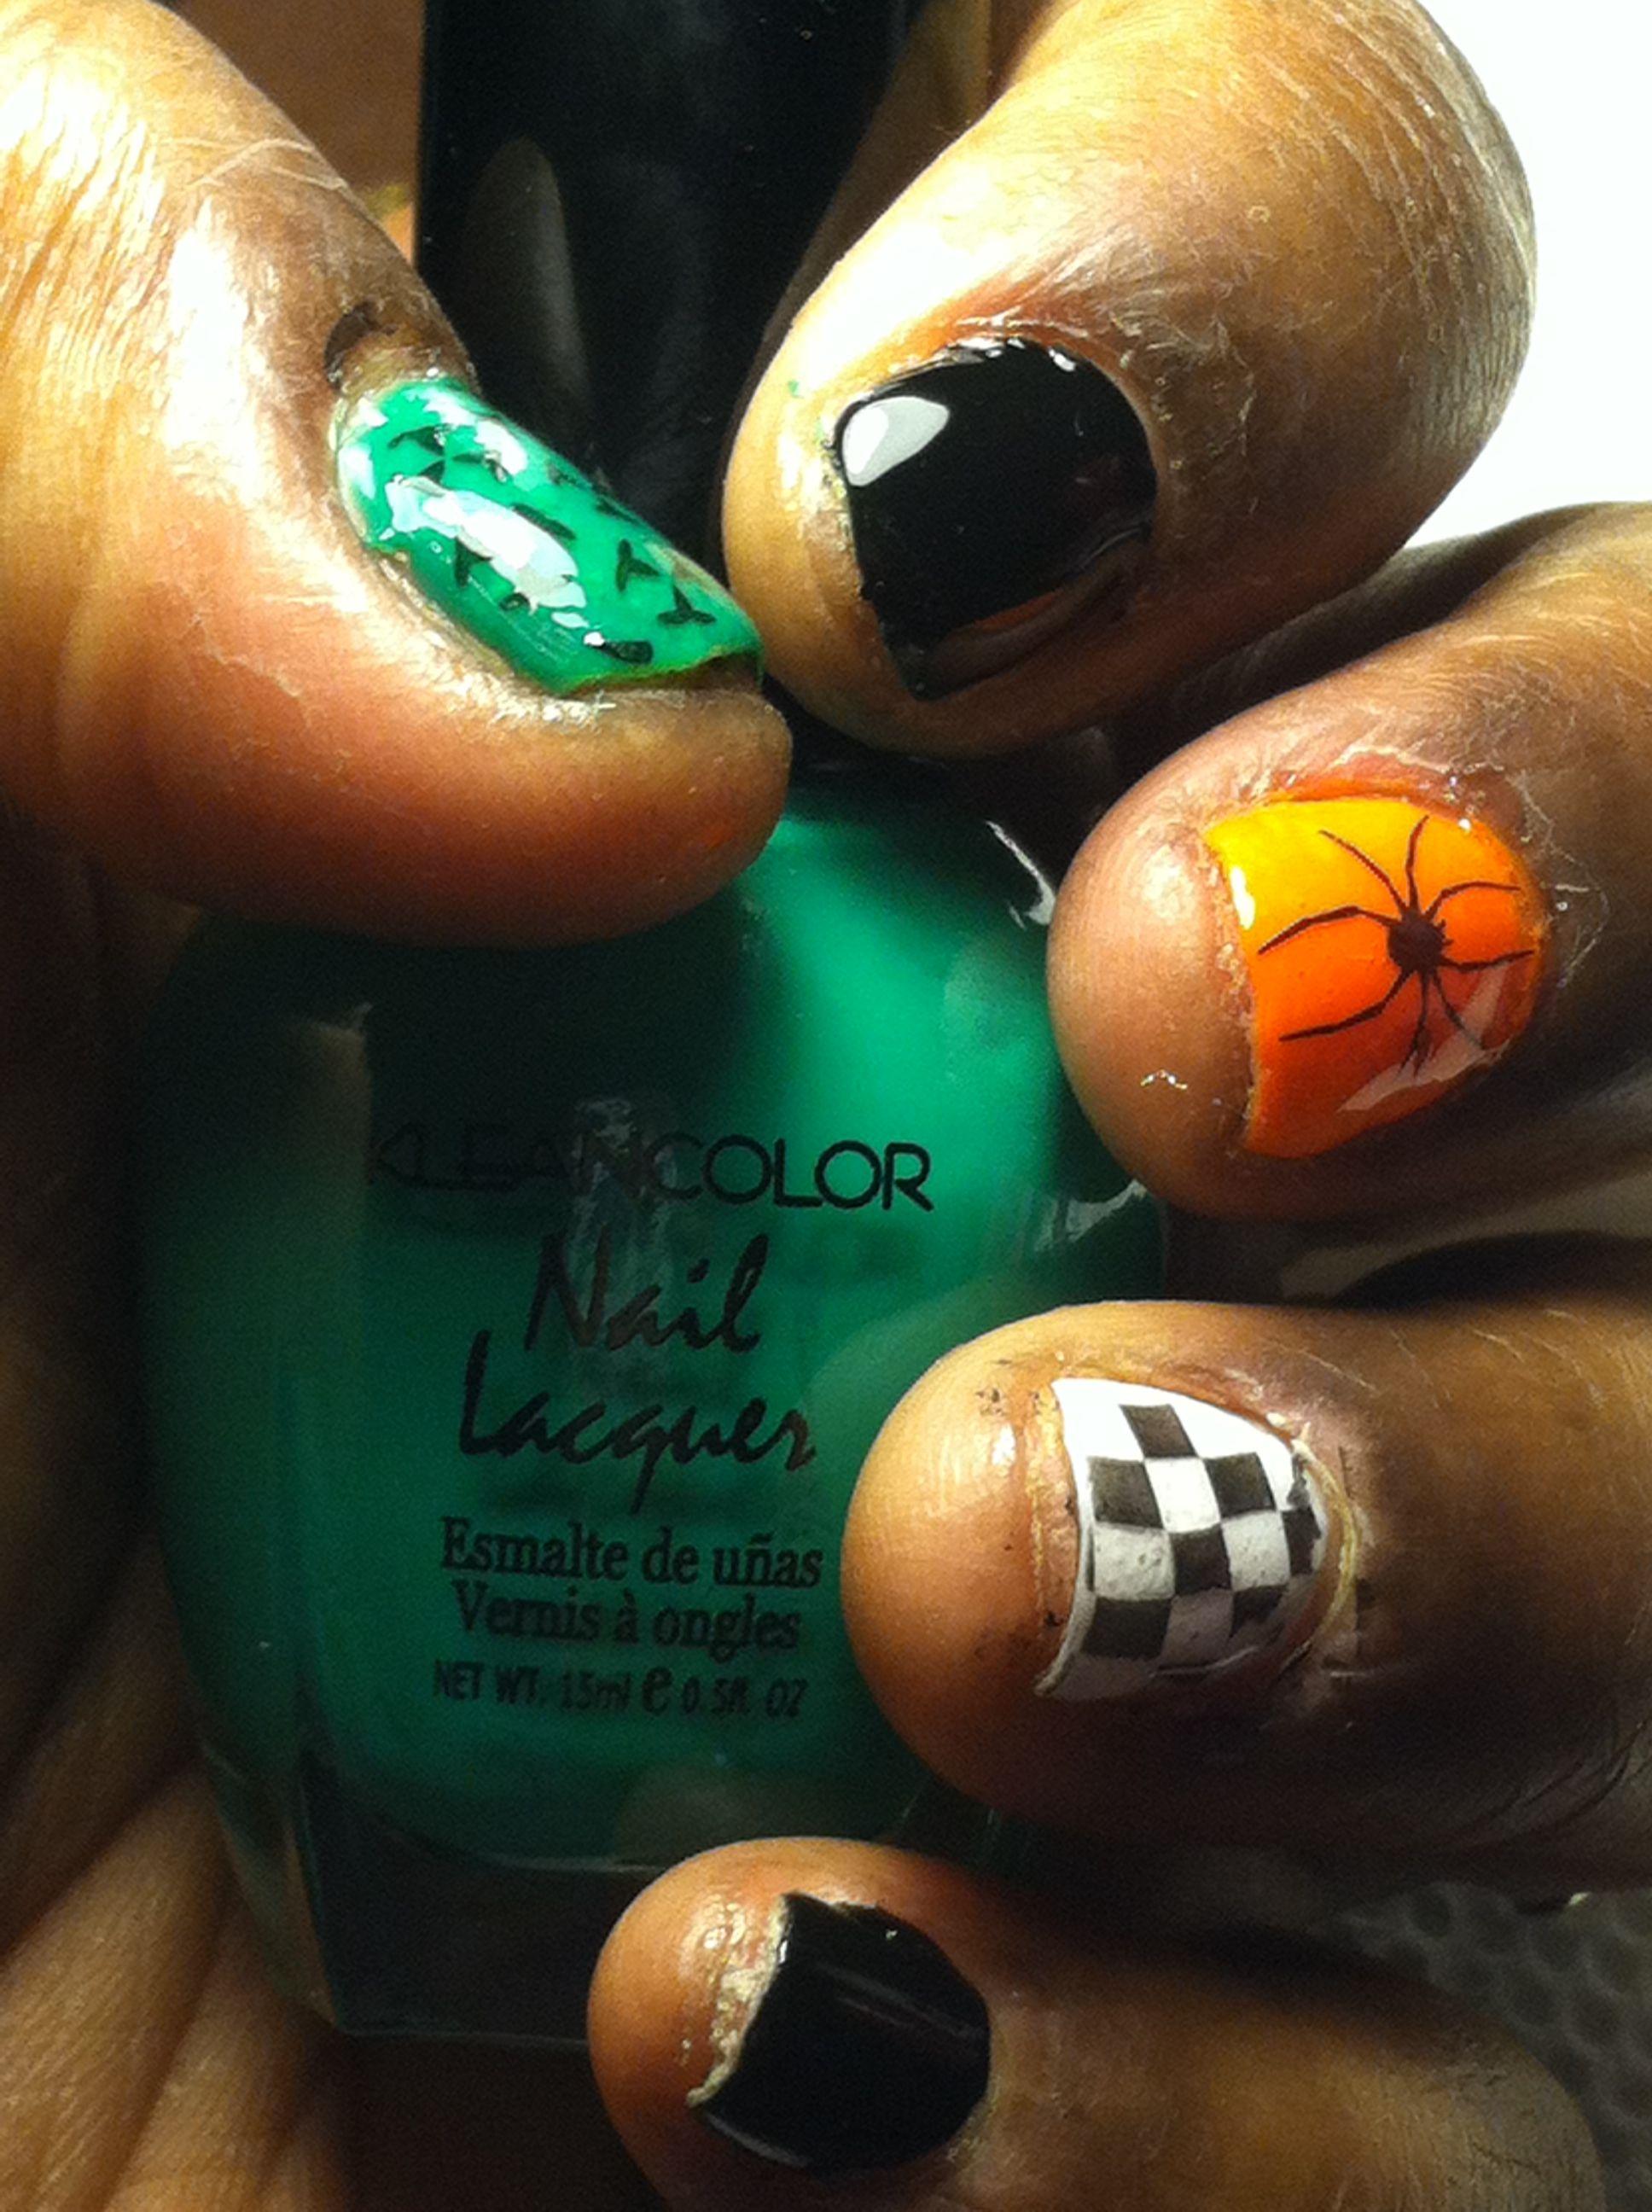 My Halloween nails 2013 | Easy toe nail designs, Beginner ...